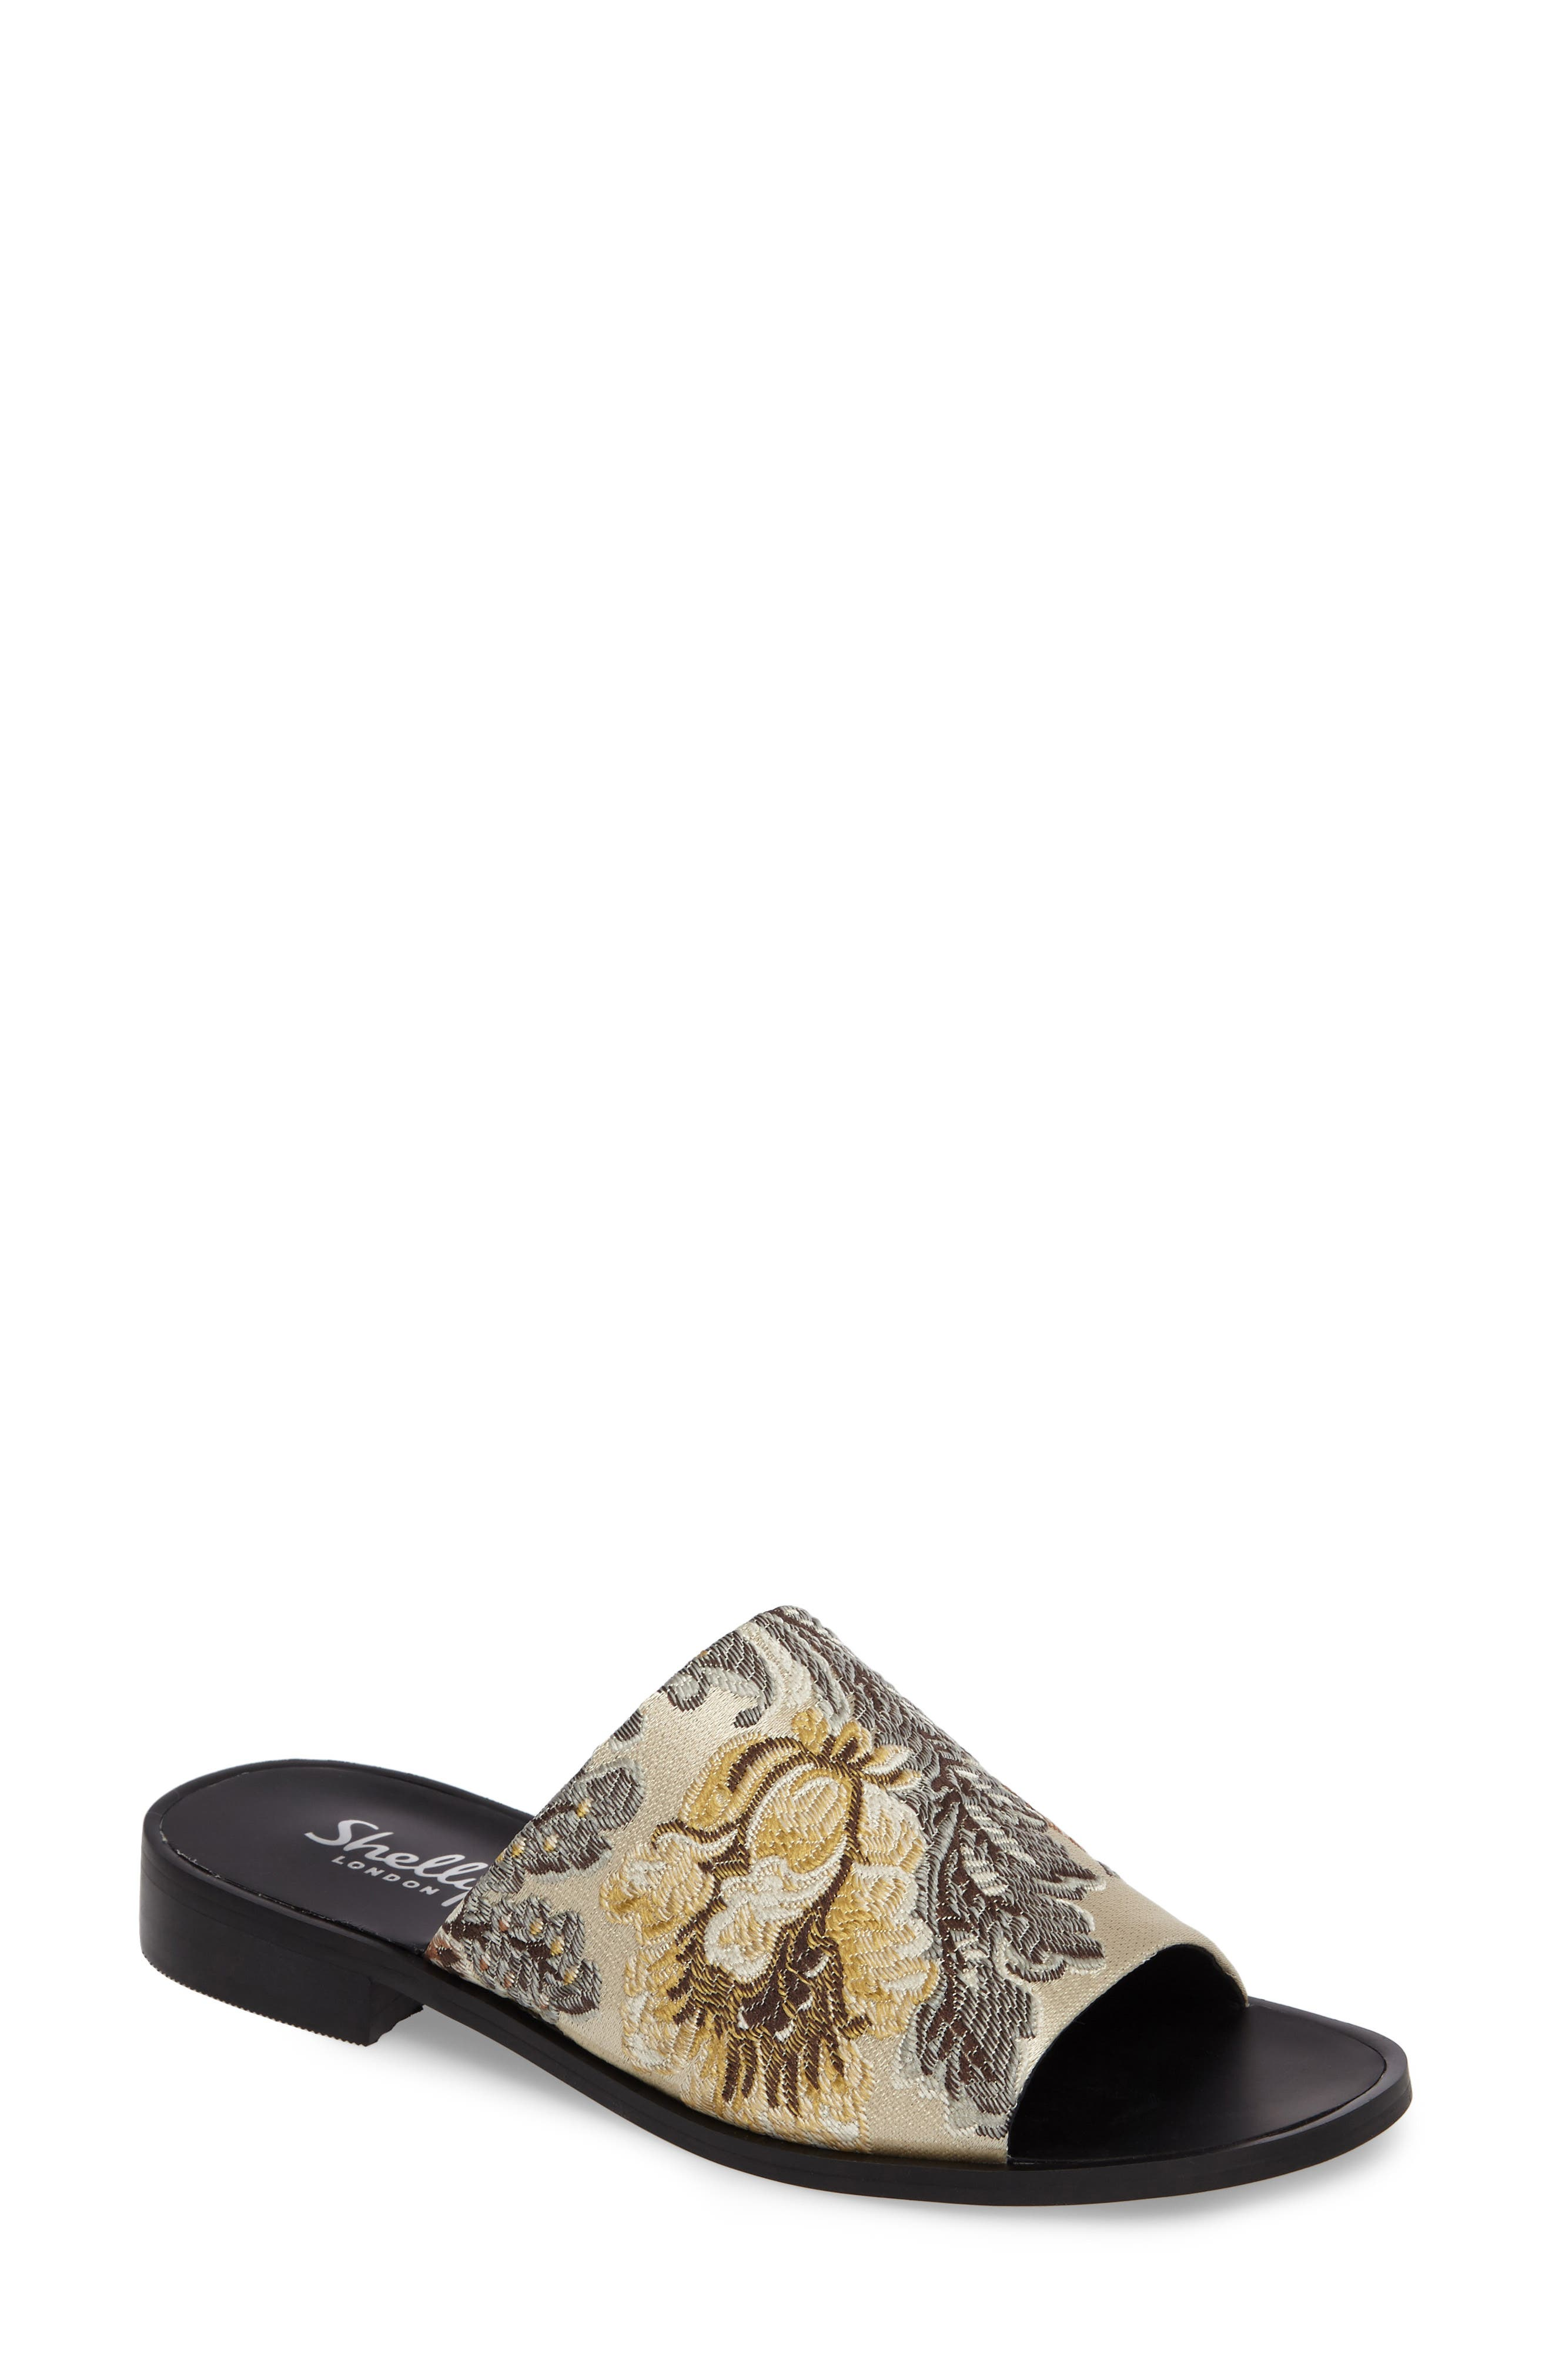 Alternate Image 1 Selected - Shellys London Enya Brocade Slide Sandal (Women)